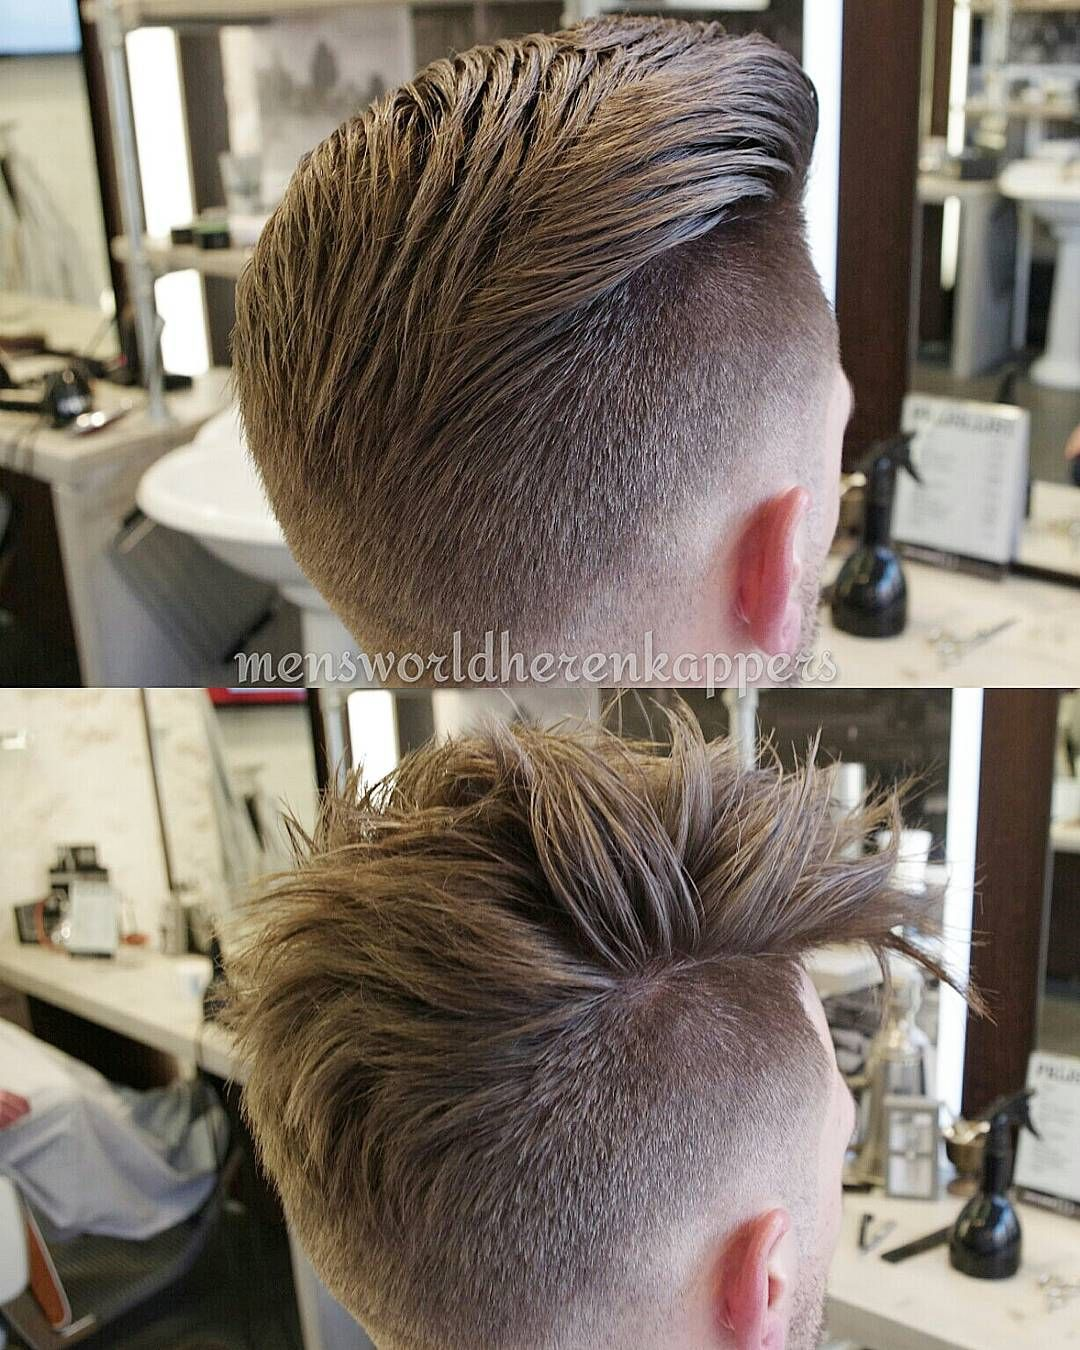 New Undercut Hairstyles For Men Undercut Styles Undercut And - Undercut hairstyle diy